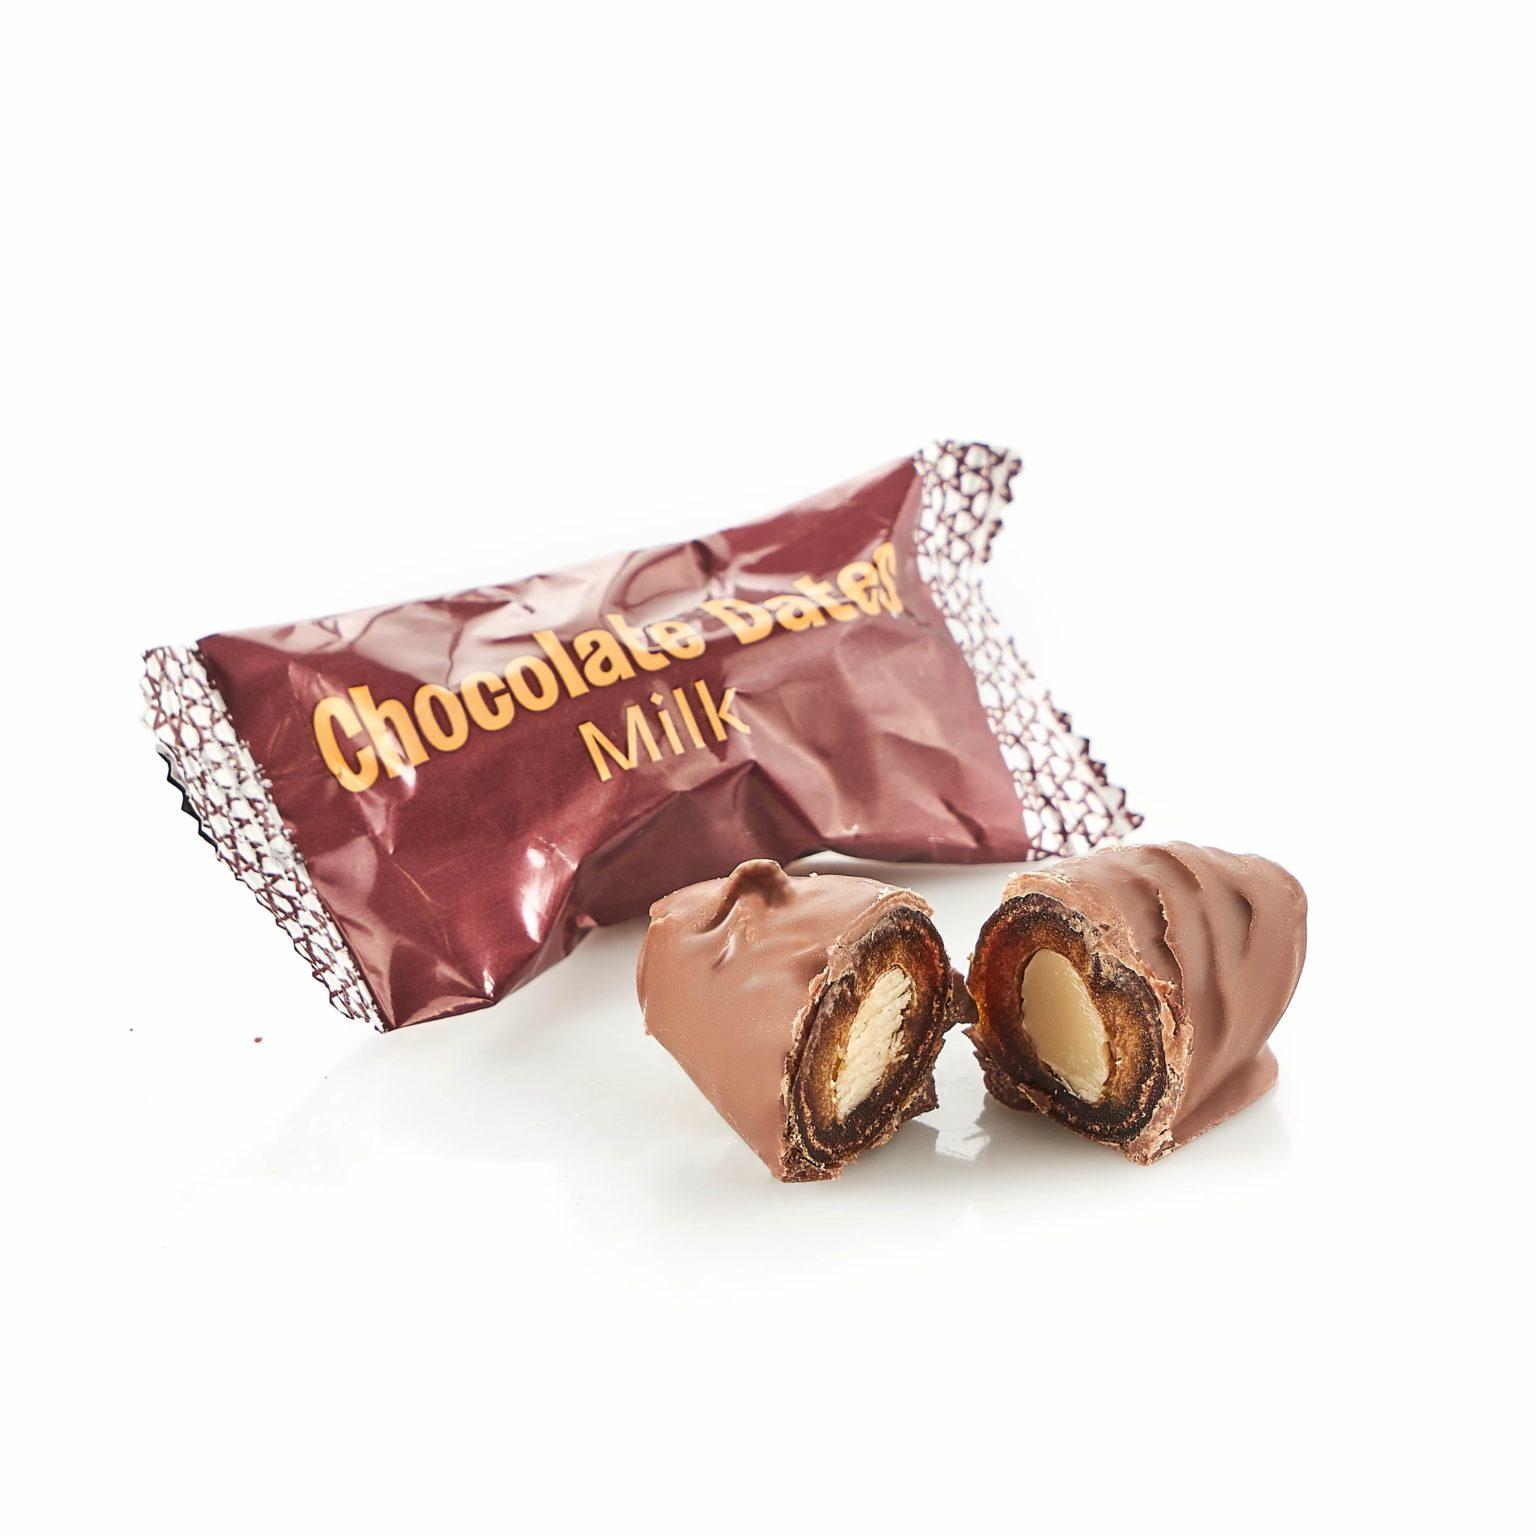 Финики в молочном шоколаде - фото 2